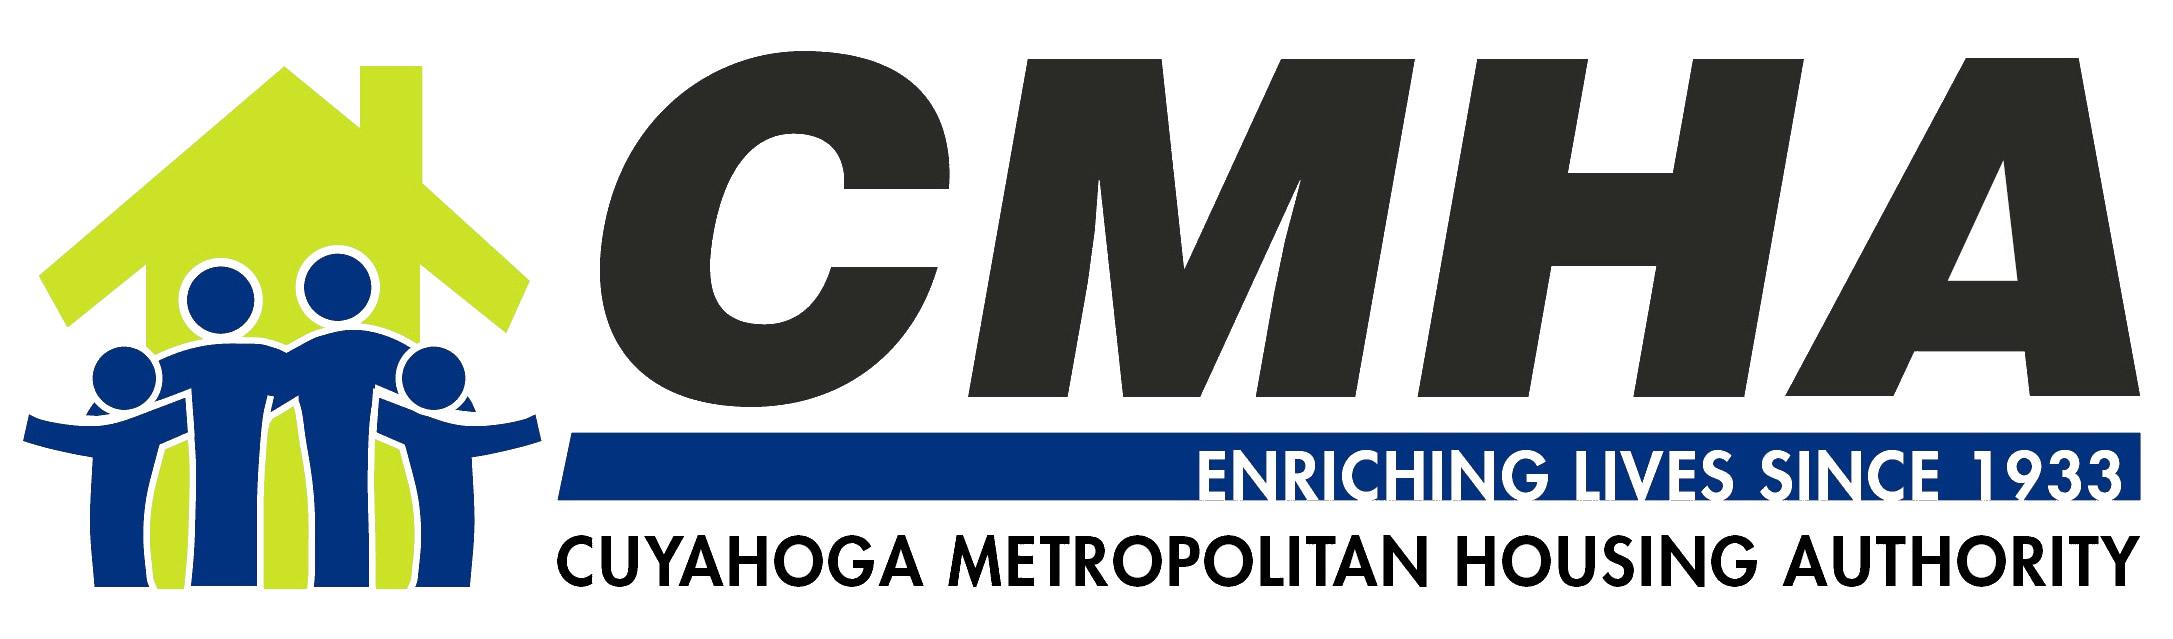 CMHA logo 02.24.12